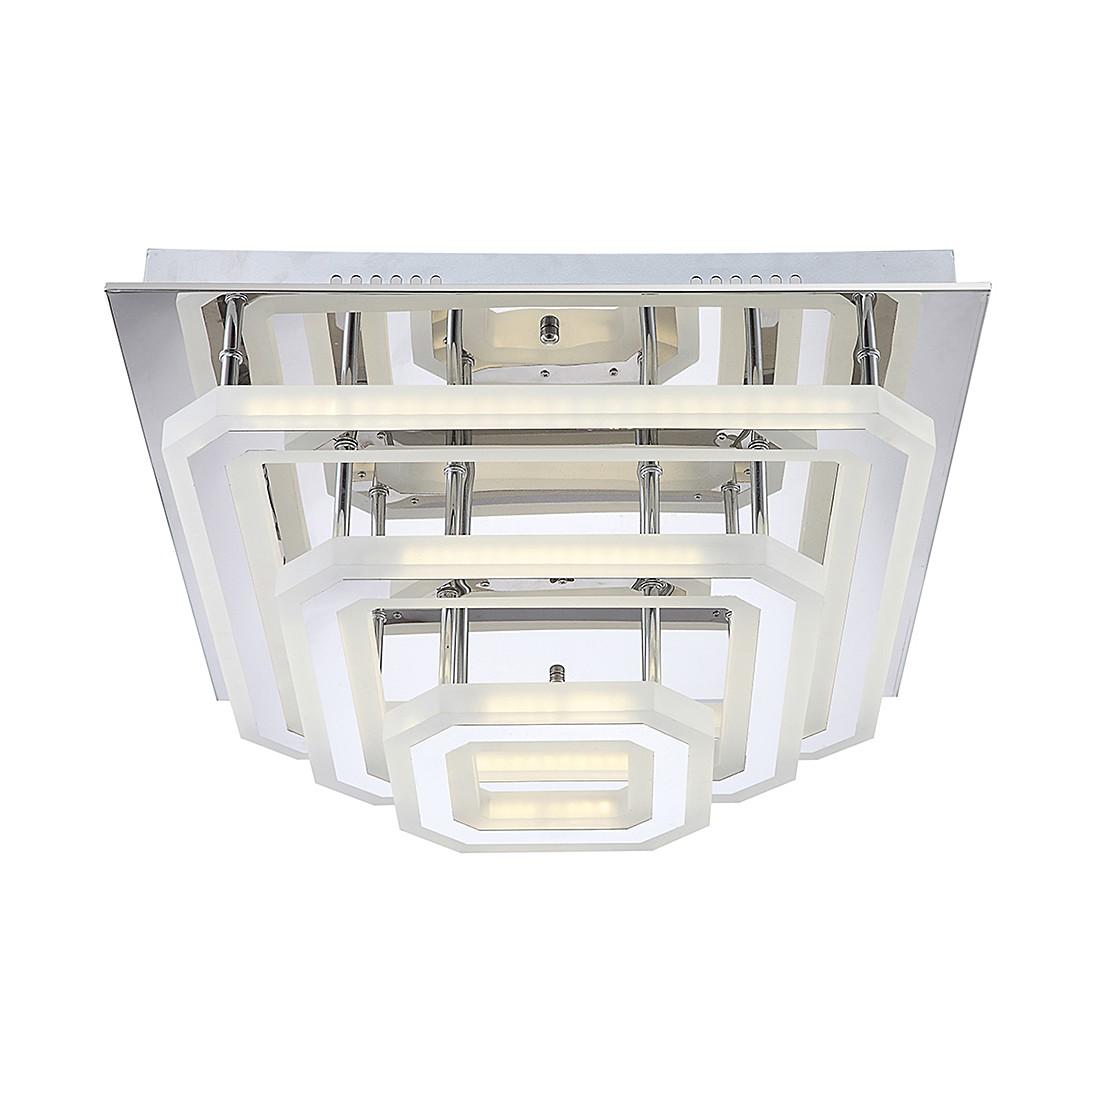 EEK A+, Deckenleuchte DL ACRYL, CHROM, 1XLED – Kunststoff – Silber – 1-flammig, Globo Lighting günstig online kaufen